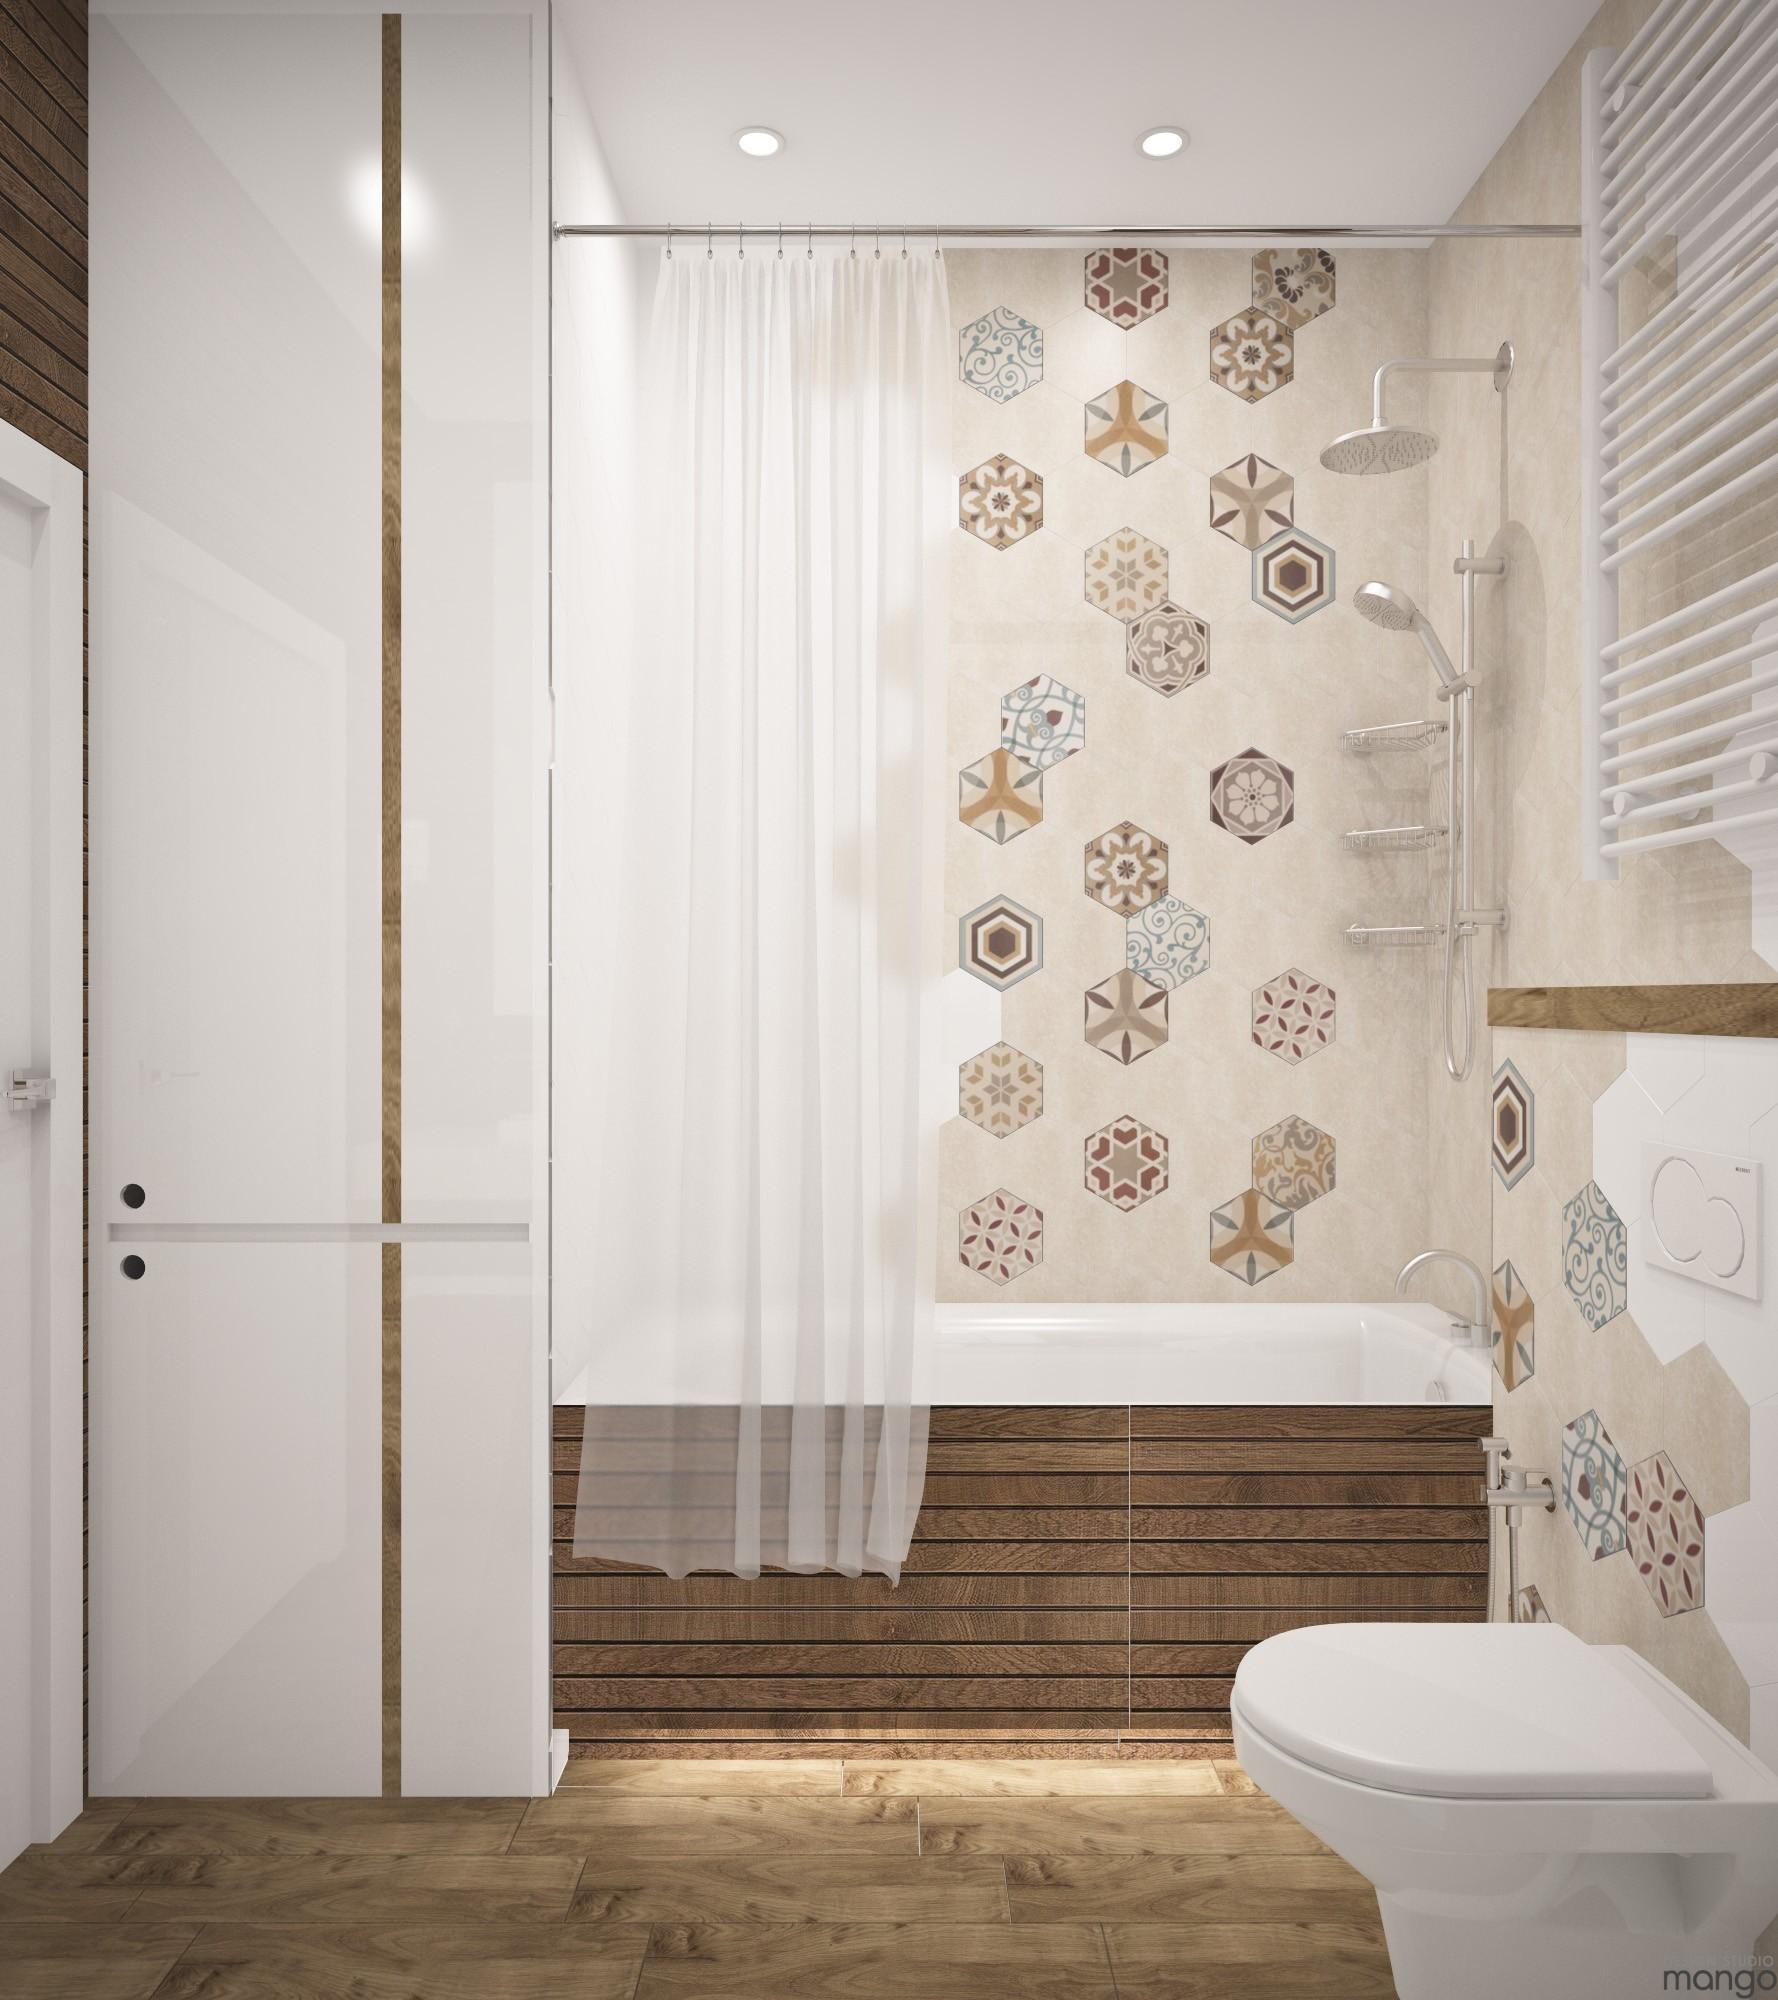 A Suitable Simple Small Bathroom Designs Looks So Perfect ... on Simple Small Bathroom Ideas  id=92735